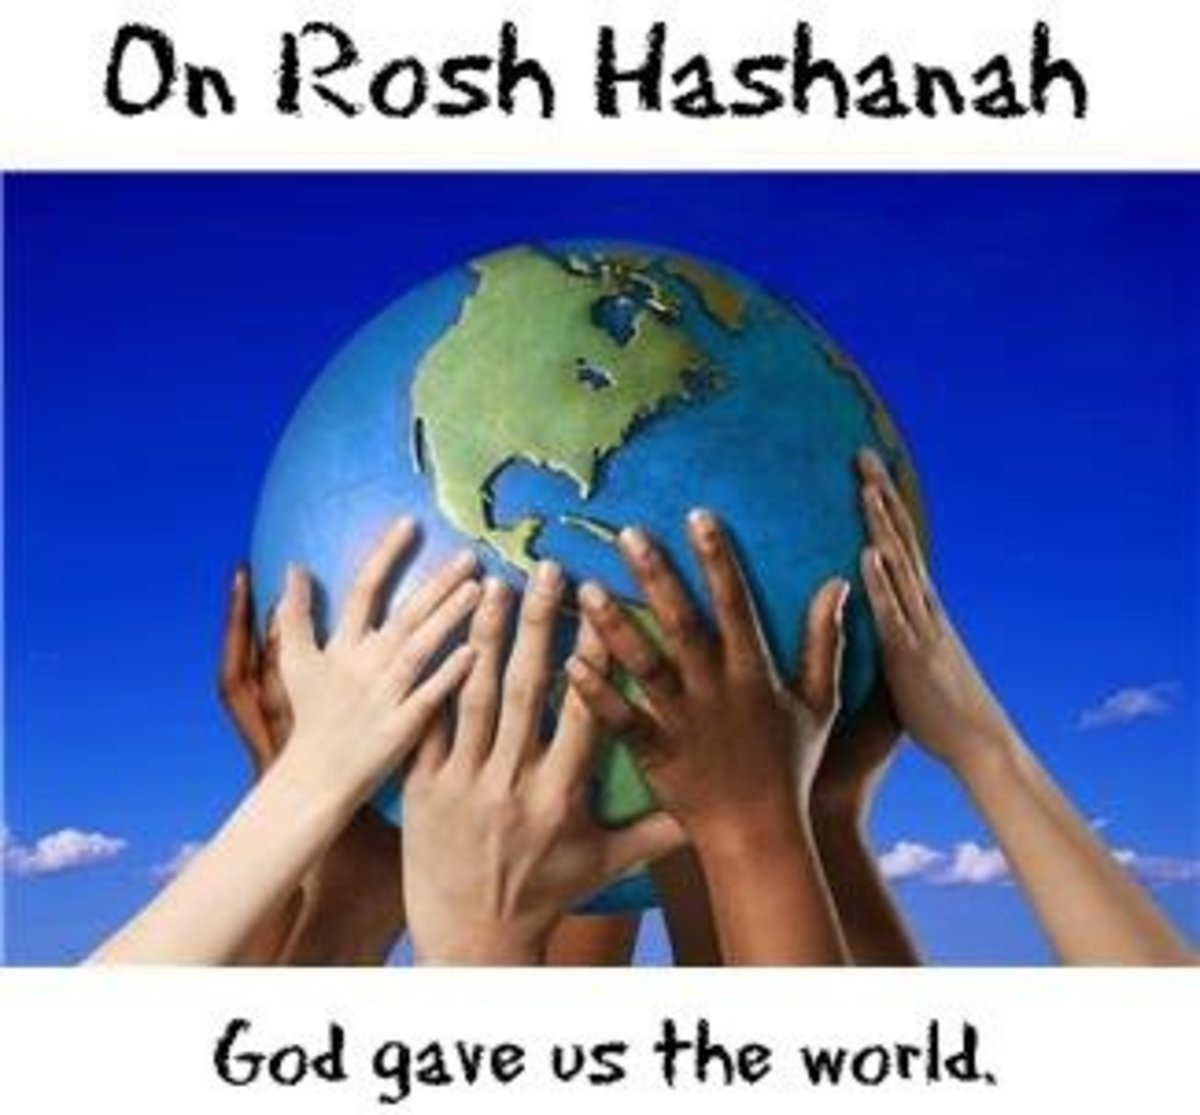 Rosh Hashanah is the birthday of the world.